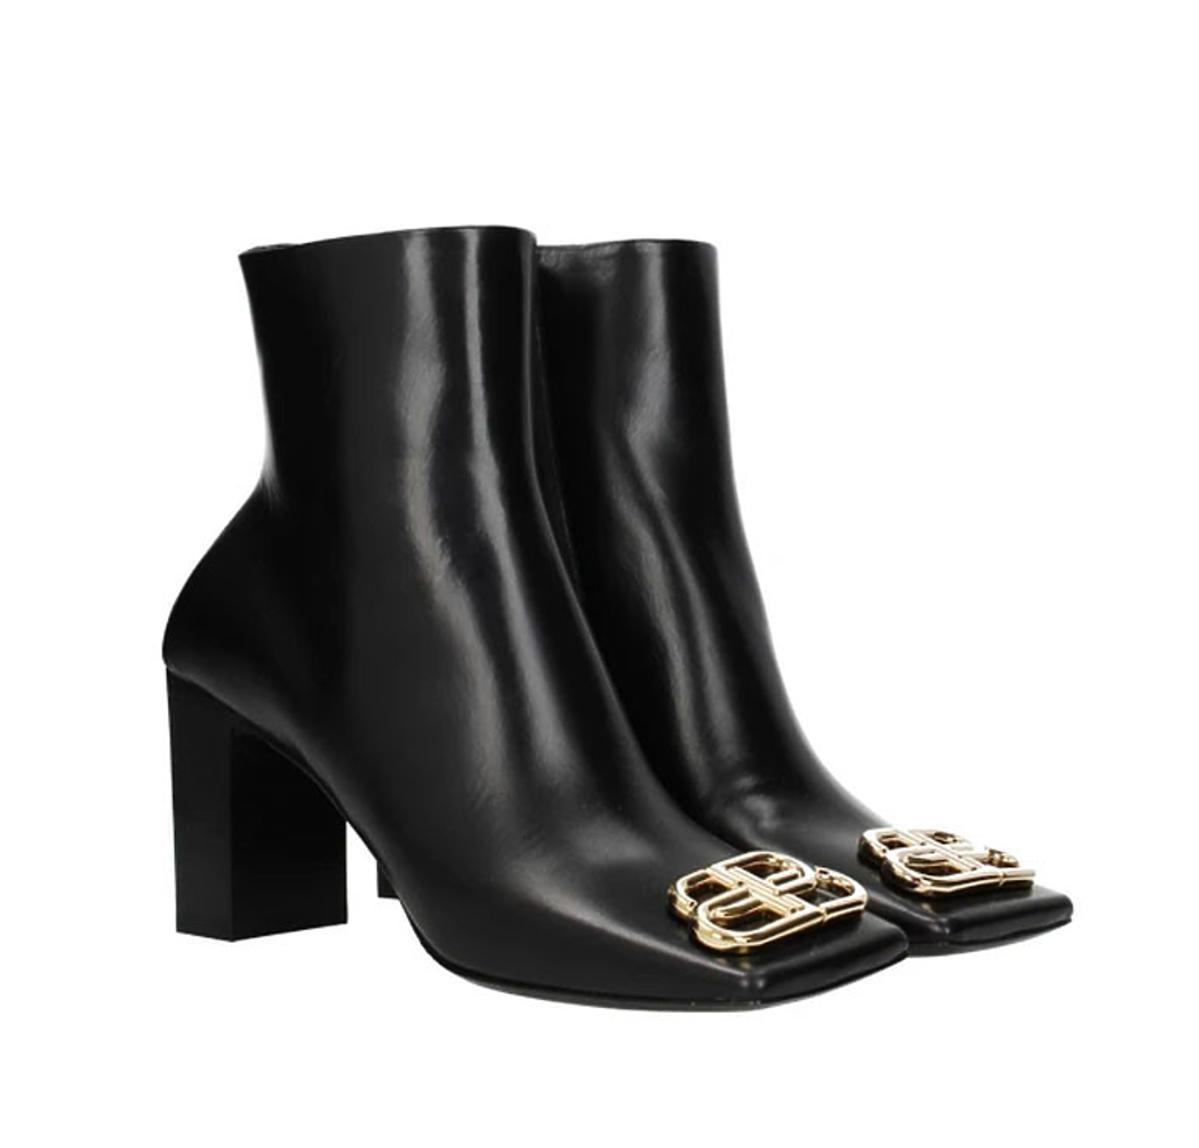 buty z klamrą Balanciaga